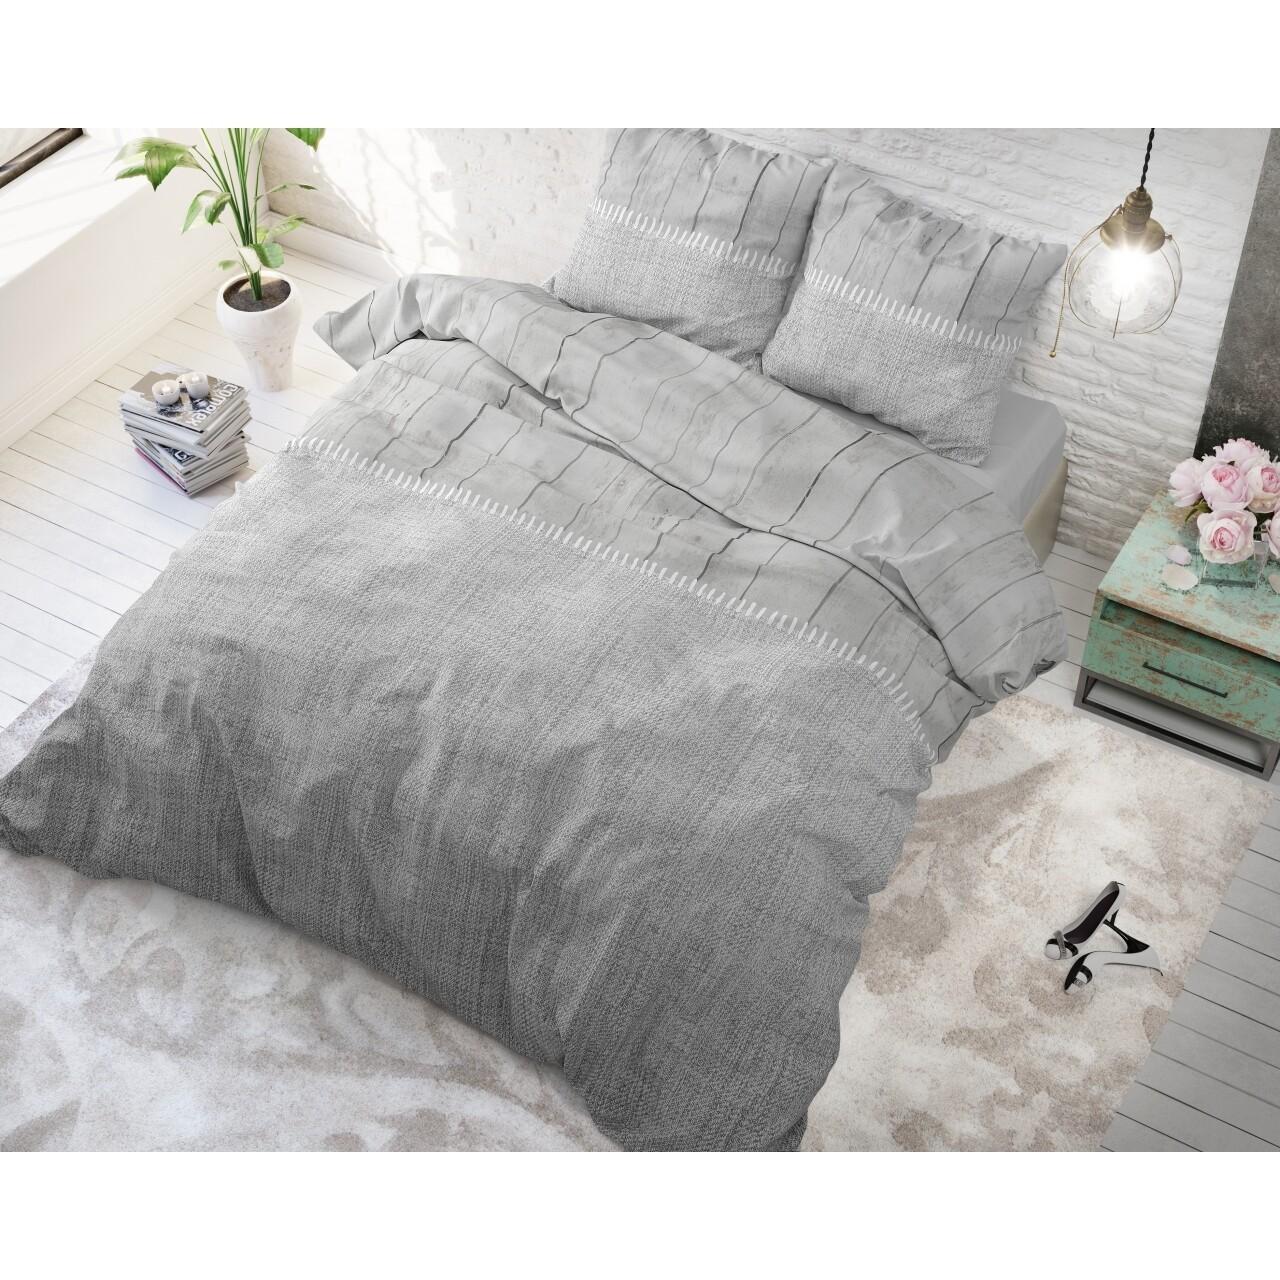 Lenjerie de pat dubla Wood Fabric Grey, Royal Textile, 3 piese, 200 x 220 cm, 100% bumbac, gri